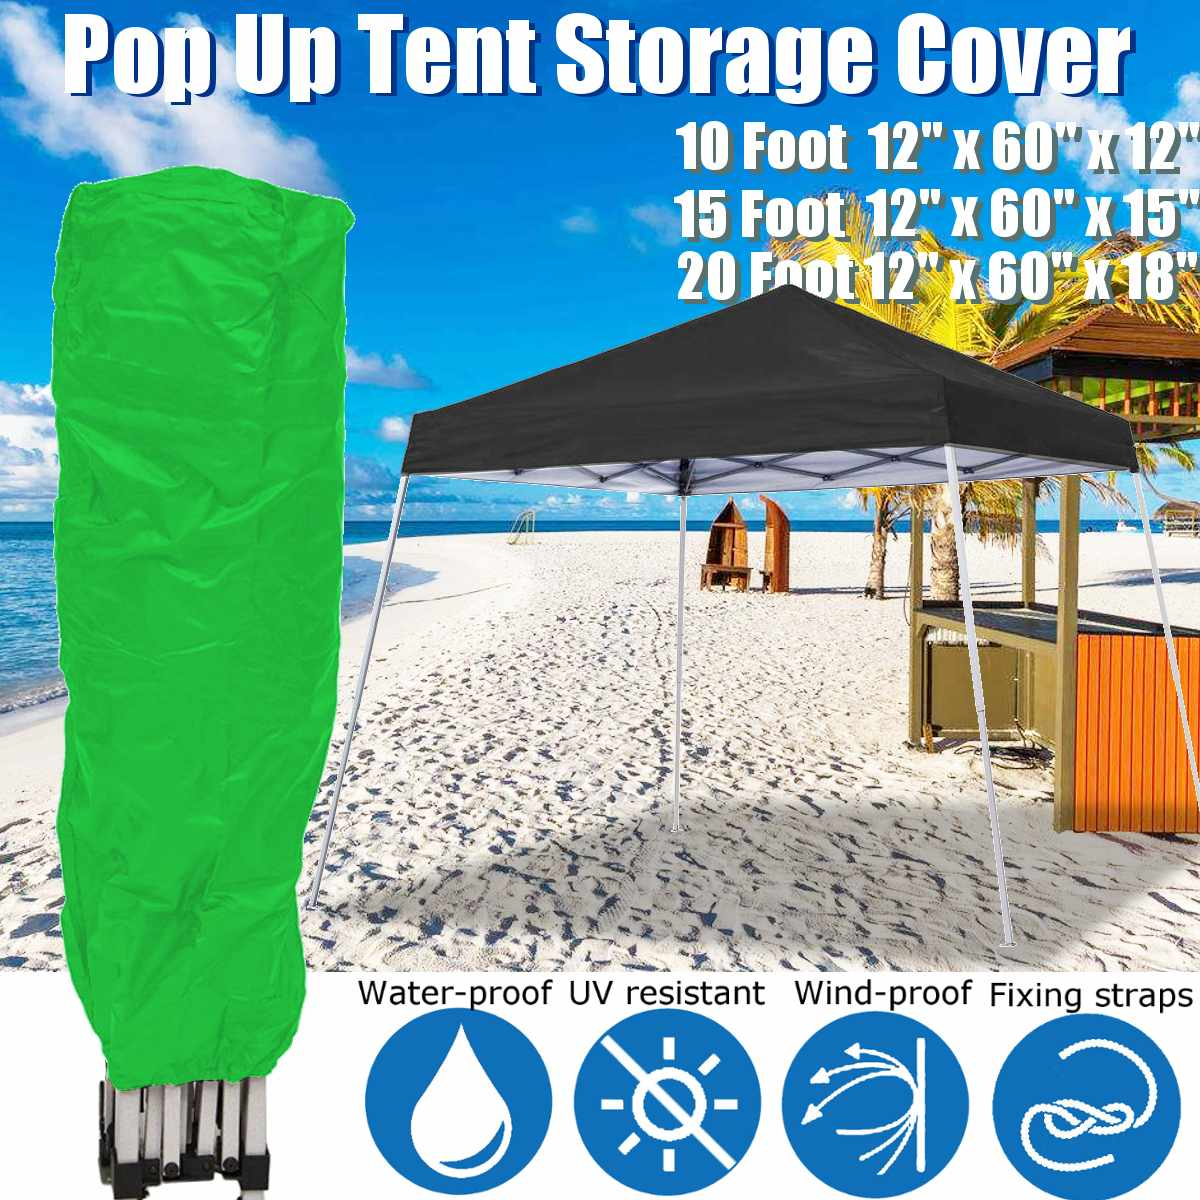 Dustproof Anti-UV Cover Bag  Pop Up Canopy Tent Storage Bag Garden Gazebos Fits 10x10/10x15/10x20 Straight Leg Canopy Frames